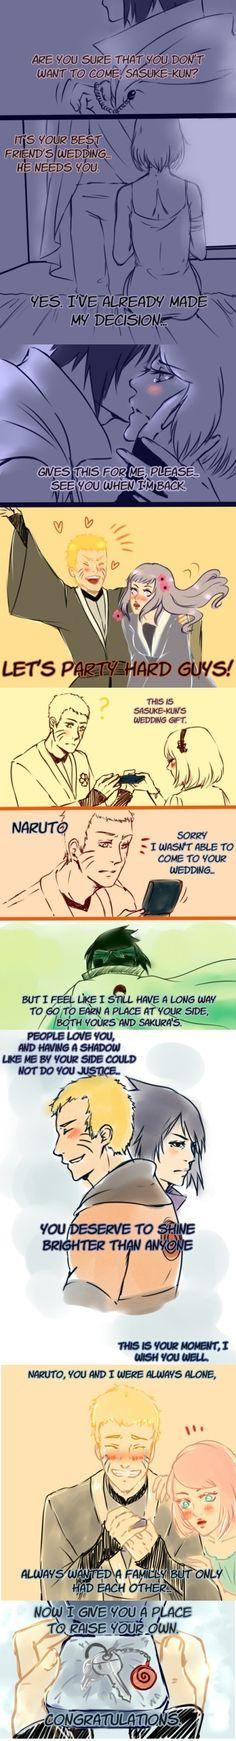 Naruto - Why Sasuke was not at Narutos wedding